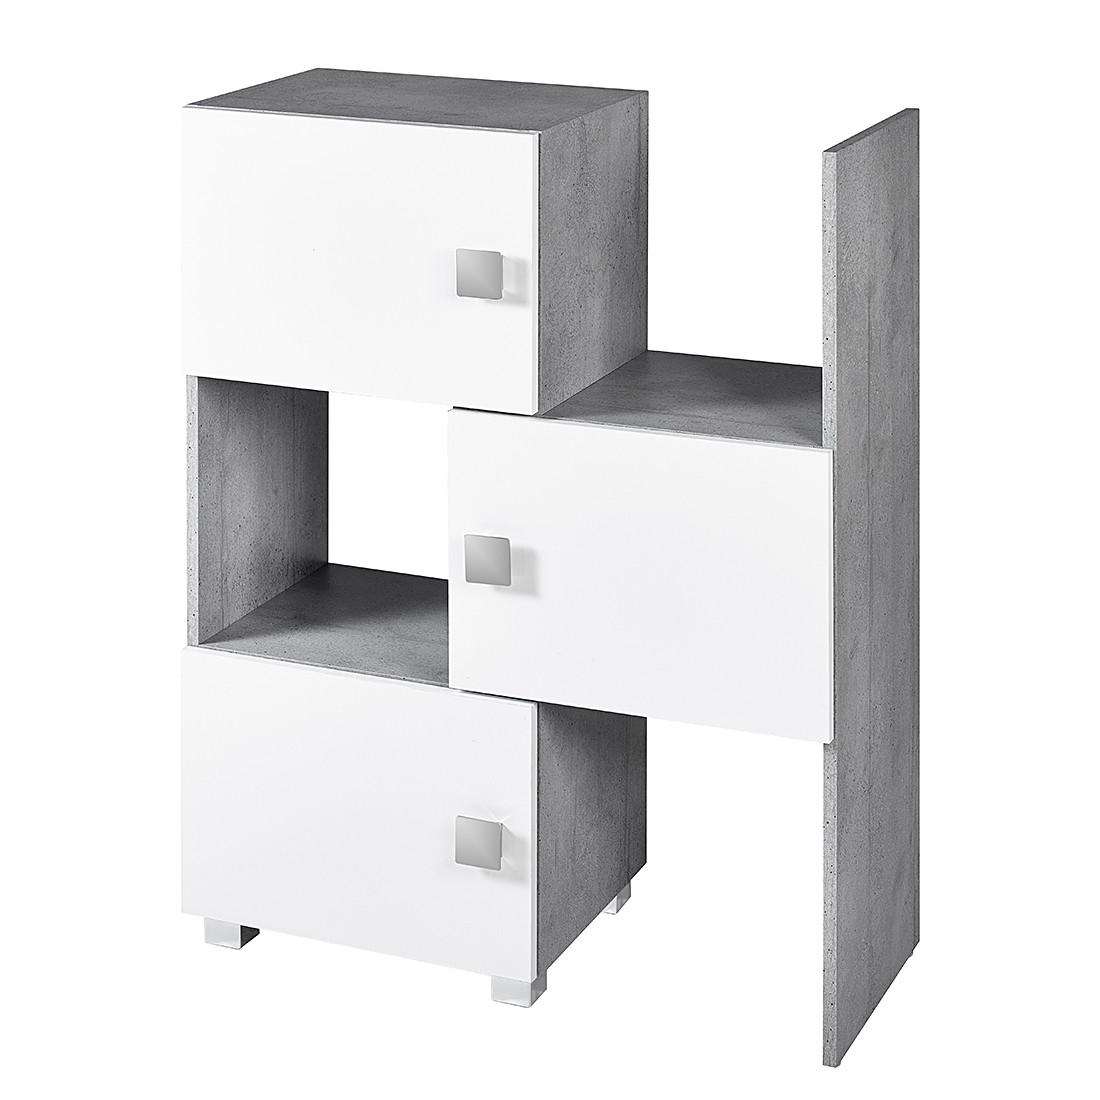 home24 Schieberegal Genf   Büro > Büroregale > Standregale   Grau   Holzwerkstoff   Schildmeyer